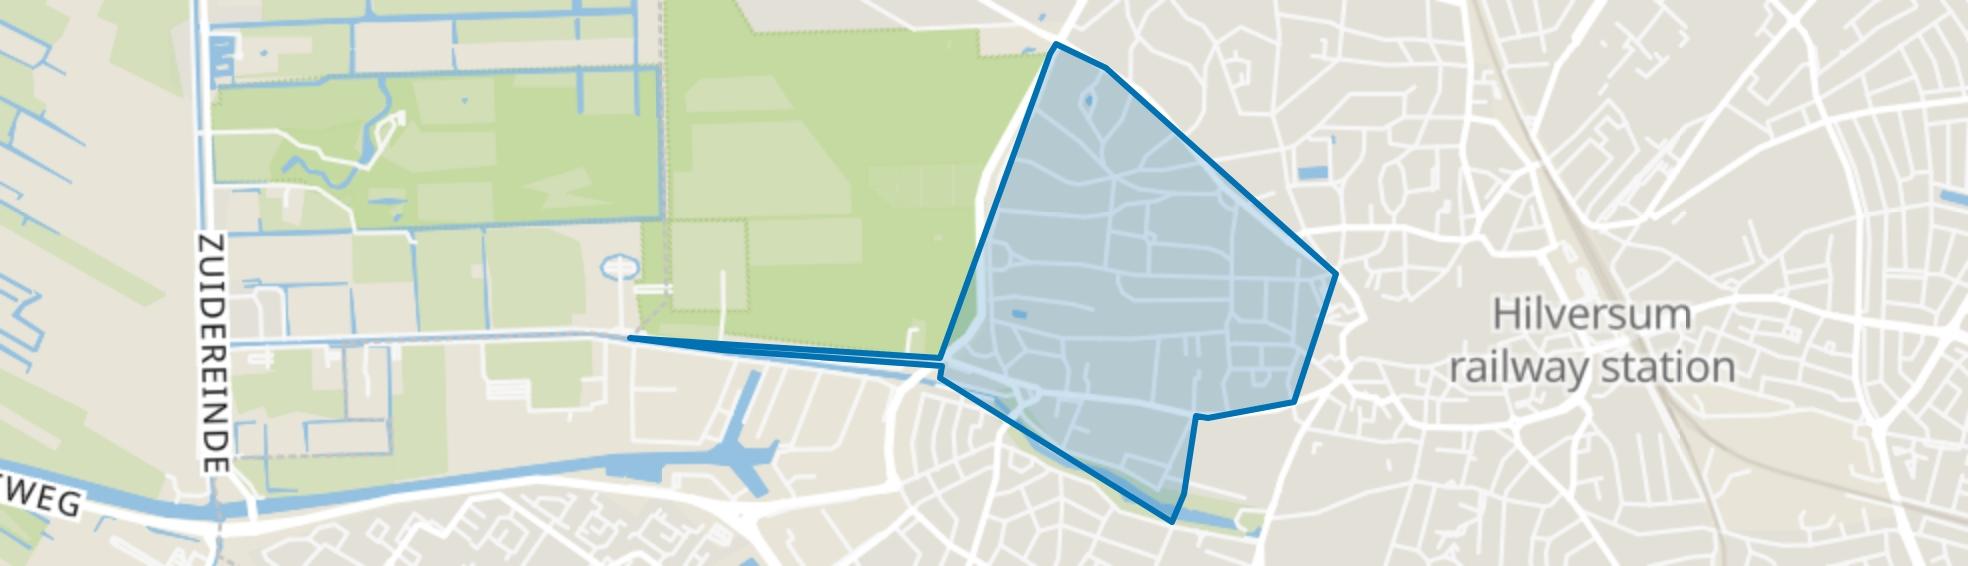 Boomberg, Hilversum map